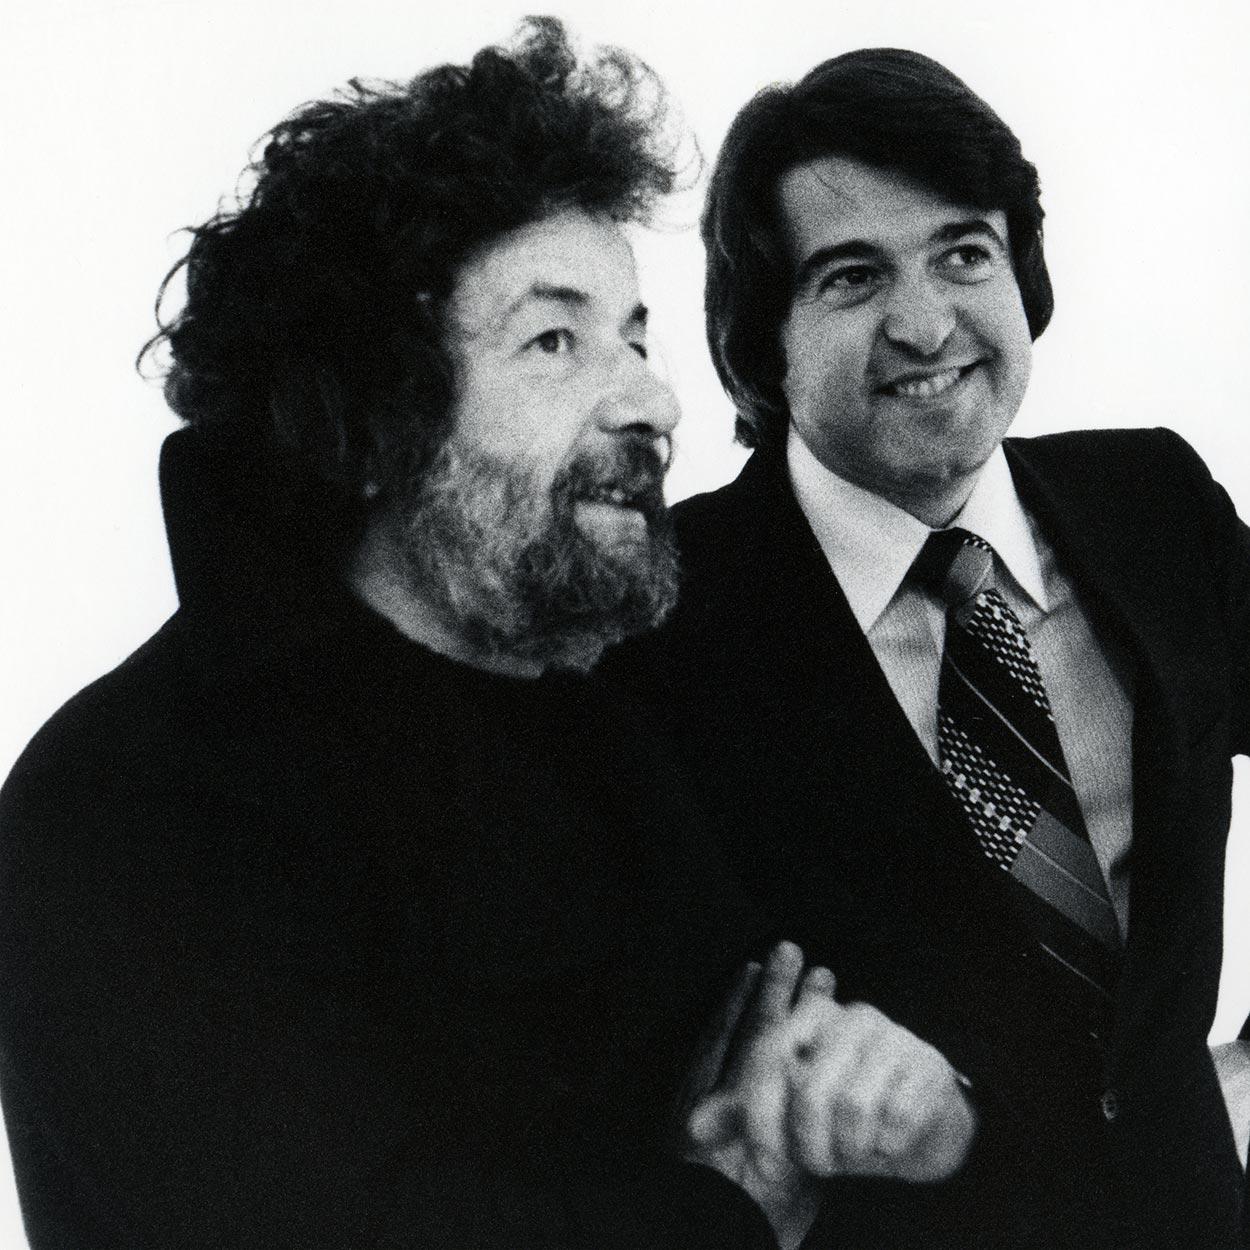 Dado sa Isy Brachot, 1978